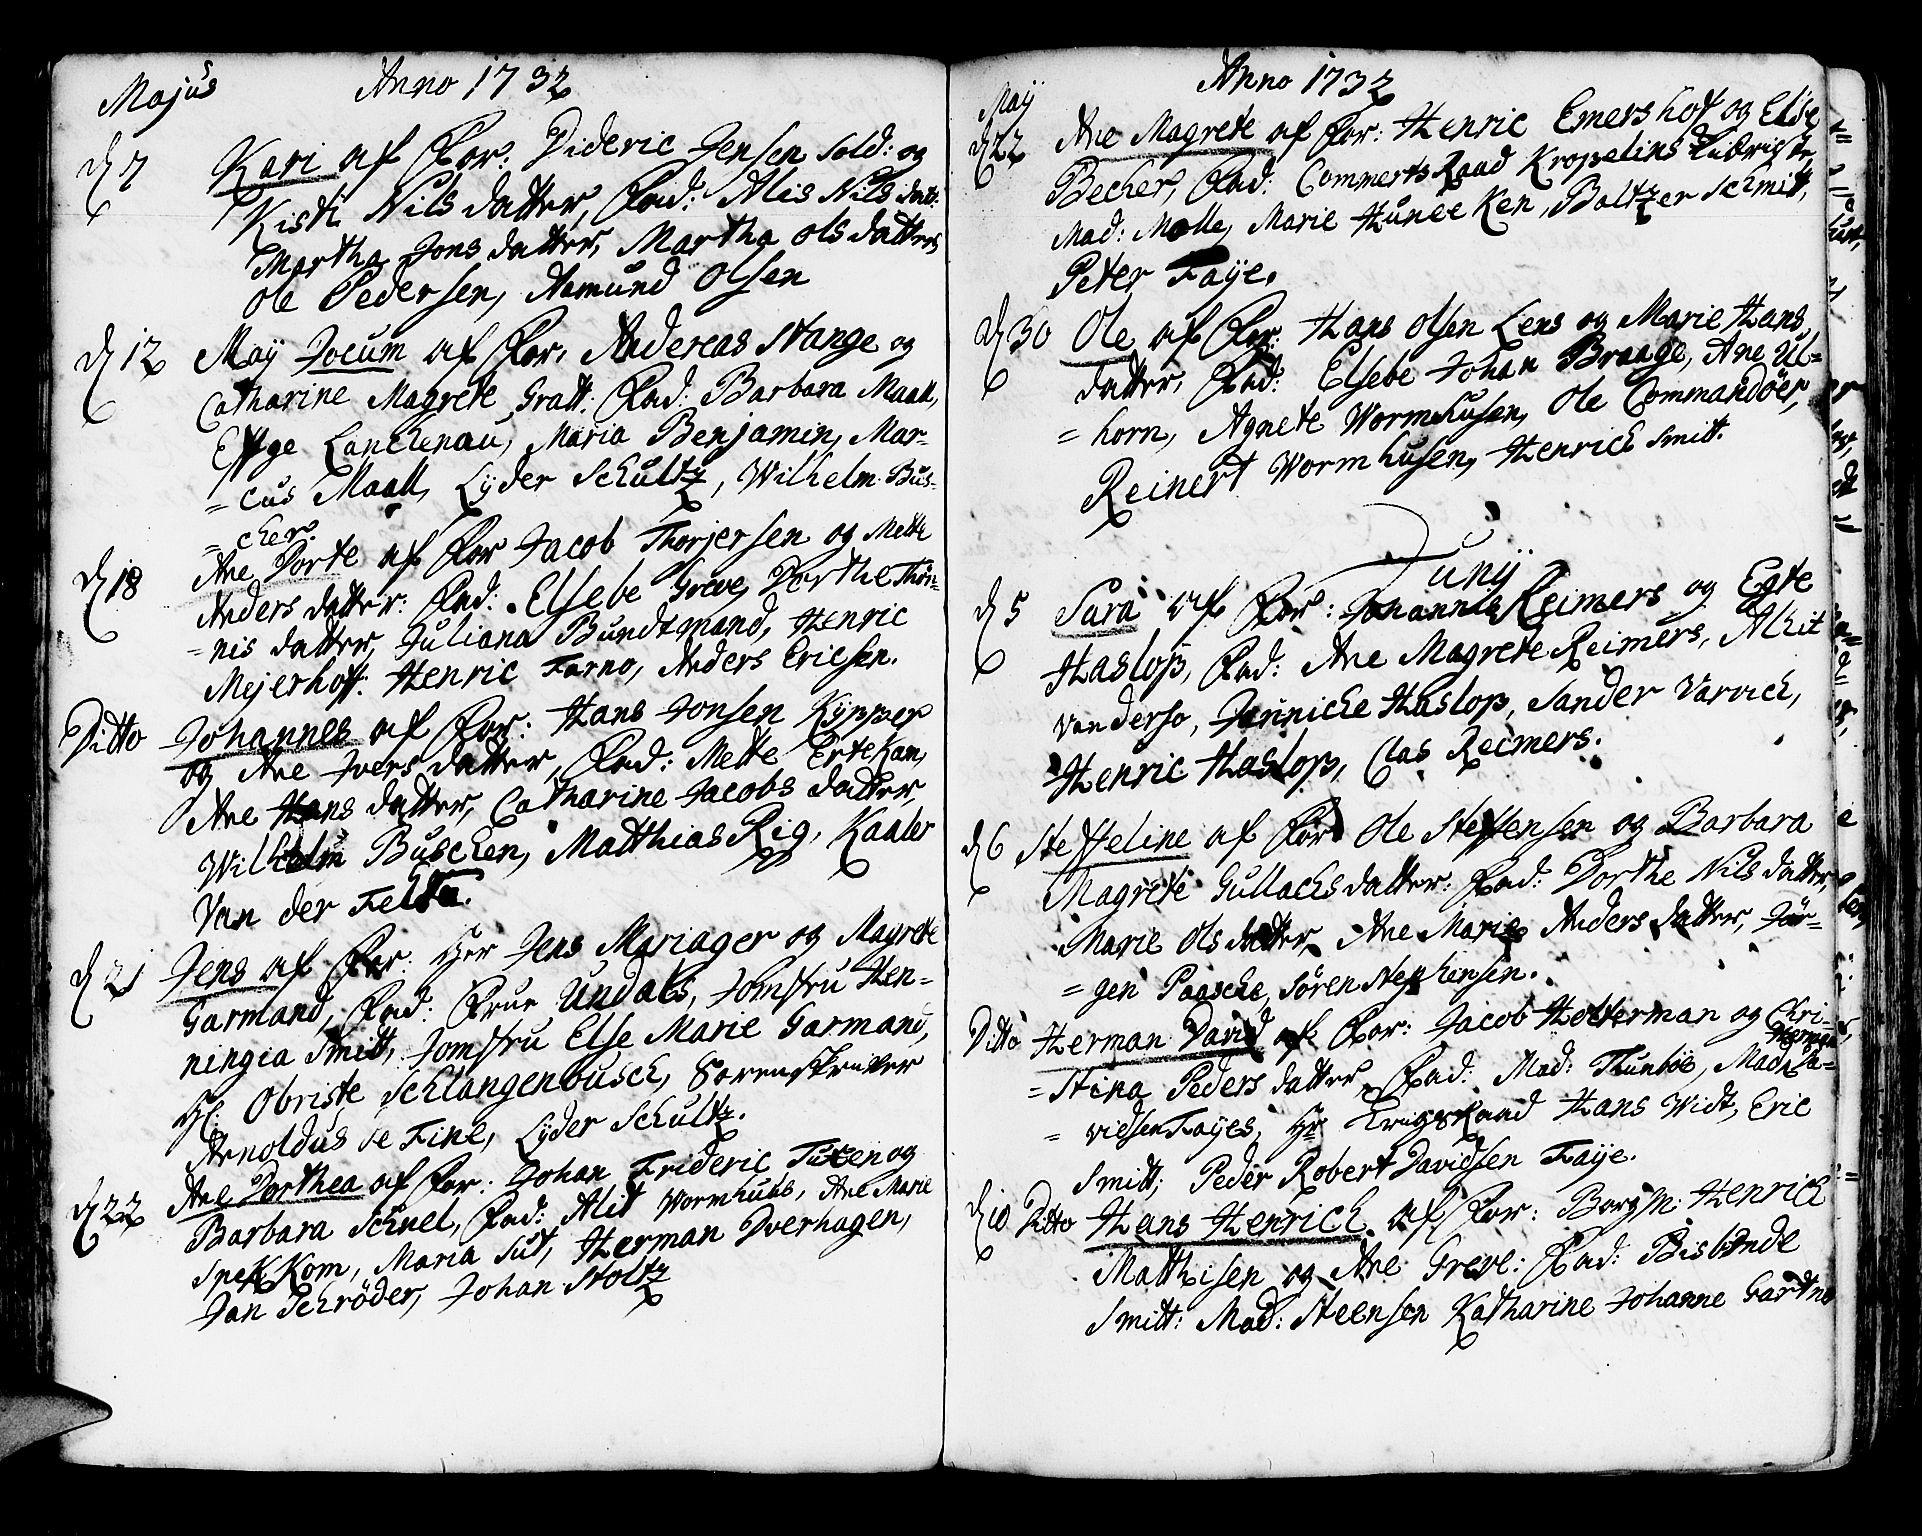 SAB, Korskirken Sokneprestembete, H/Haa/L0004: Ministerialbok nr. A 4, 1720-1750, s. 111